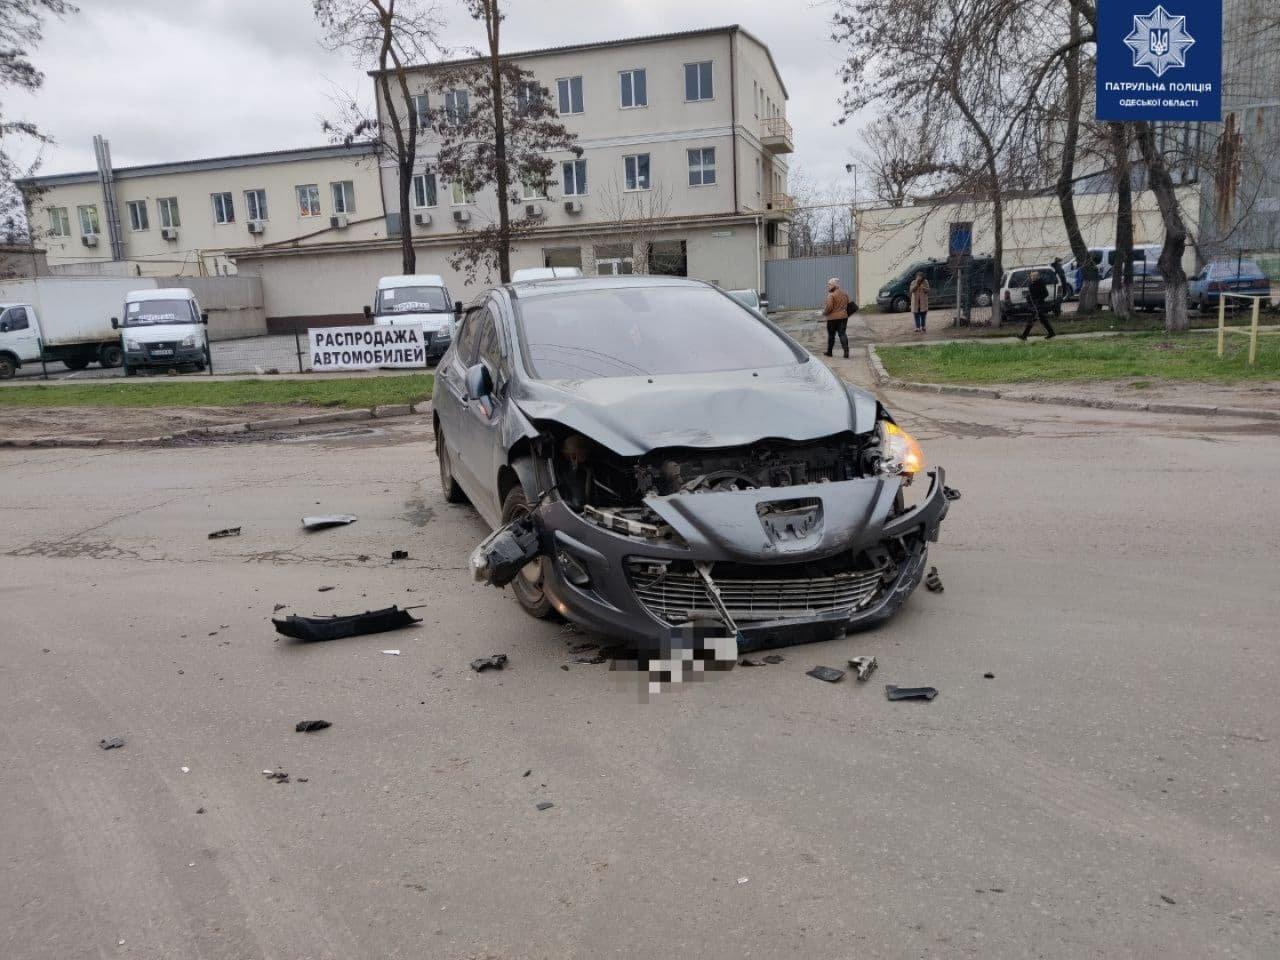 В Одессе в ДТП пострадал мотоциклист, - ФОТО, фото-1